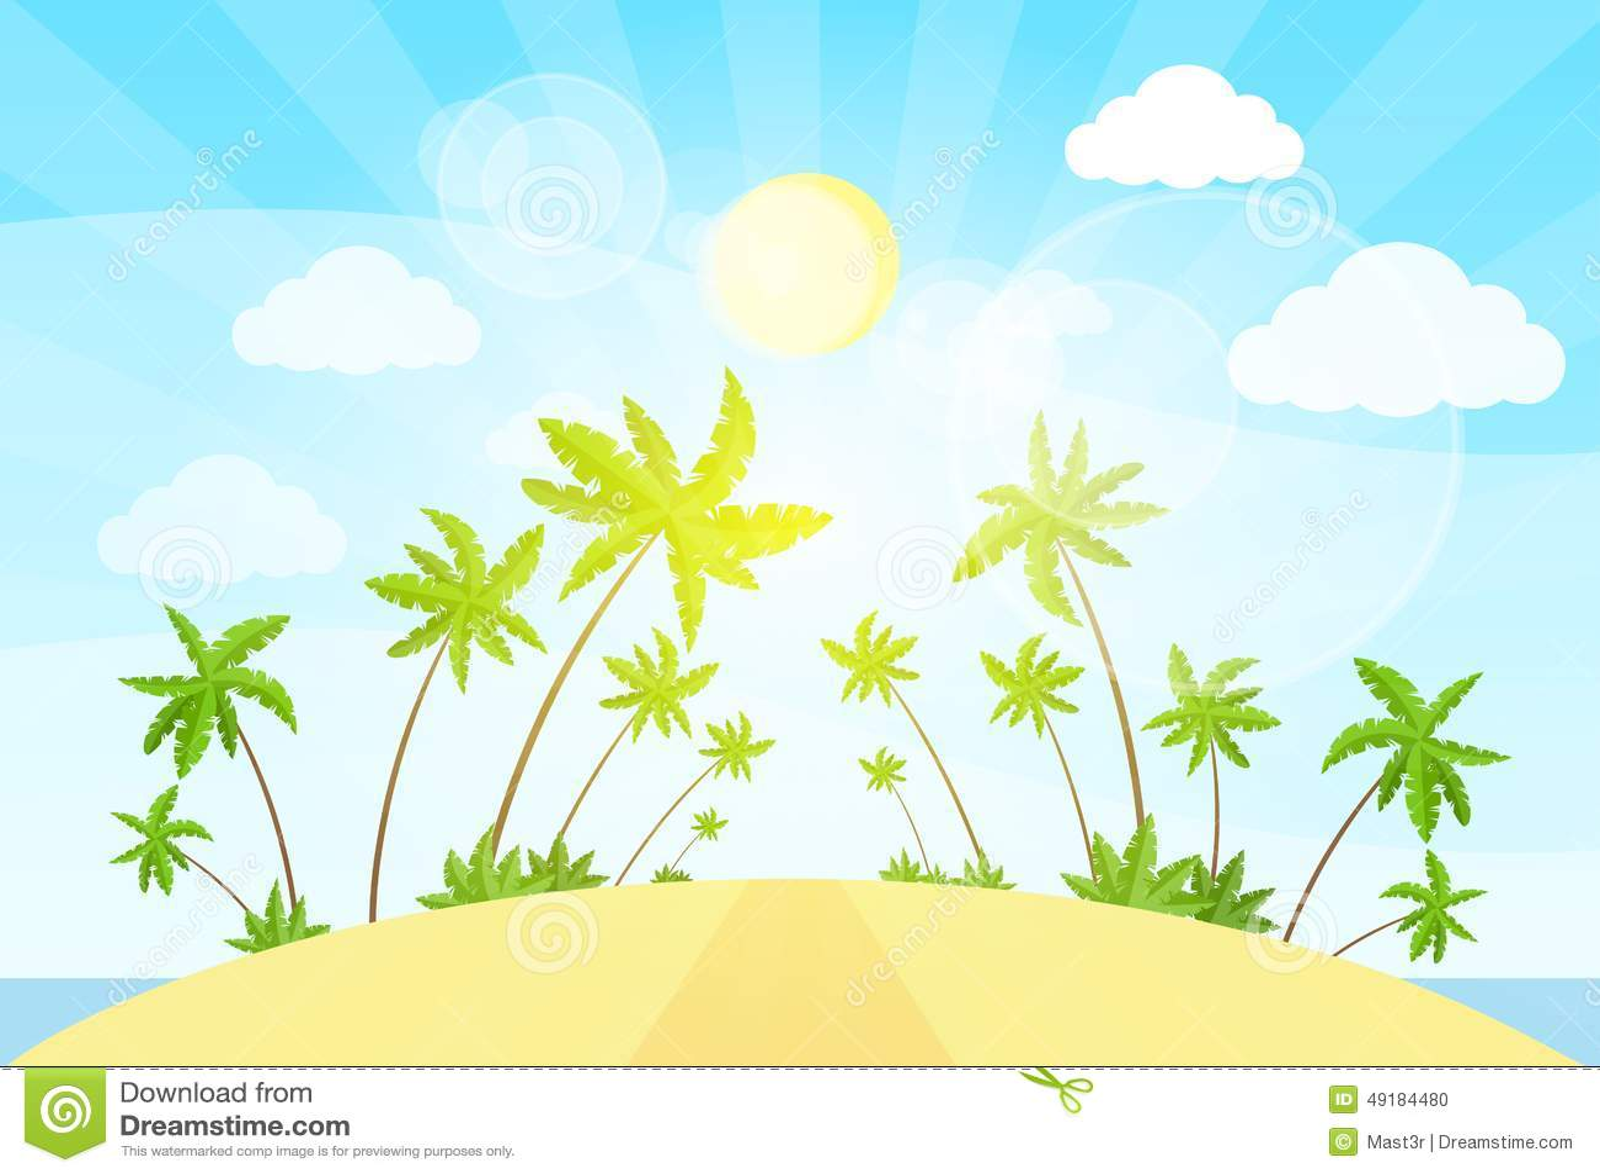 Tropical Island Cartoon: Tropical Island With Cartoon Palm Tree And Sun Royalty